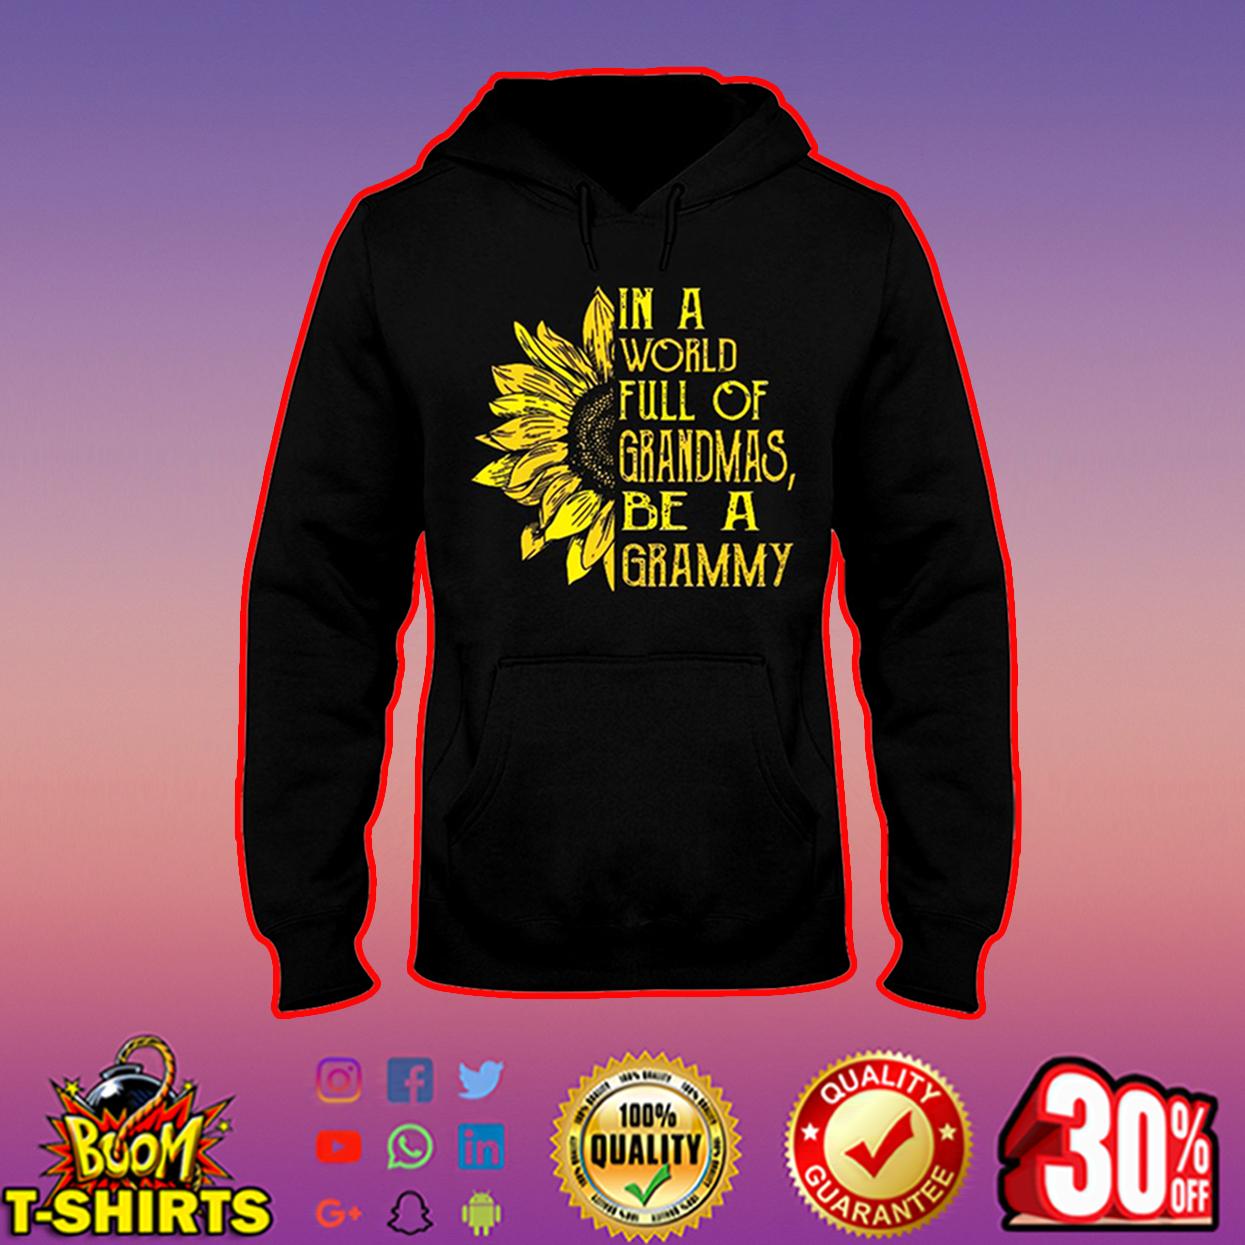 Sunflower in a world full of grandmas be a grammy shirt, hooded sweatshirt